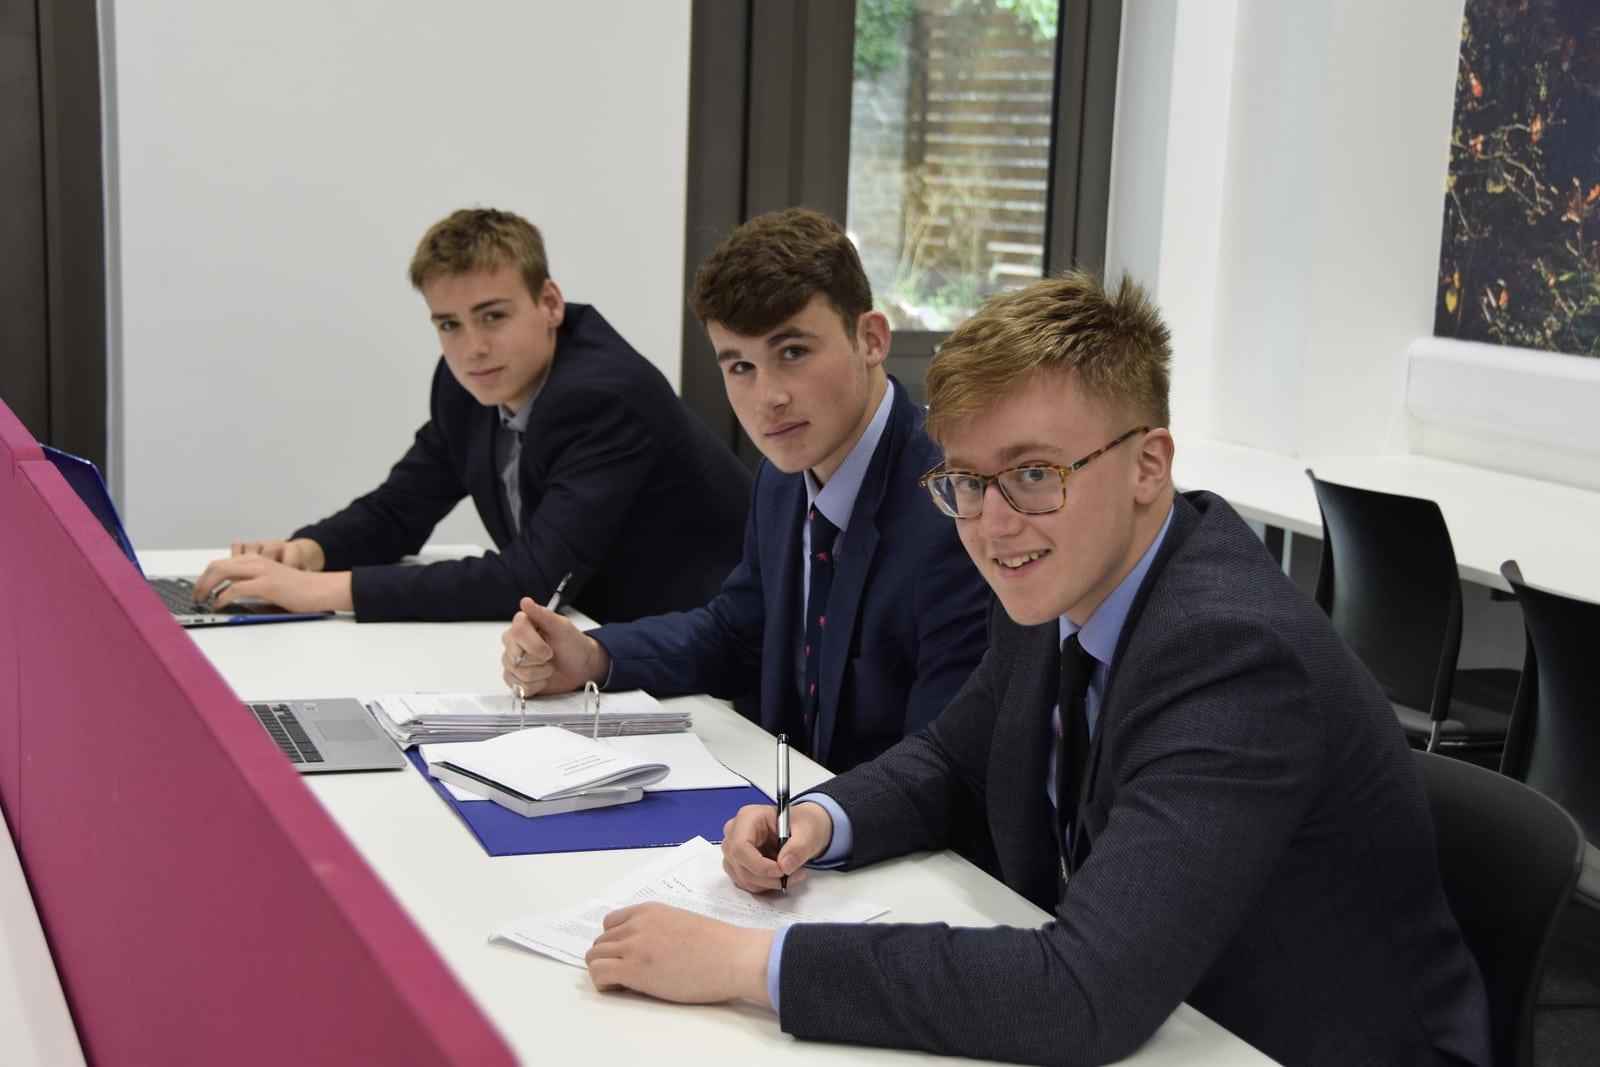 Abingdon School Sixth Form Scholarships